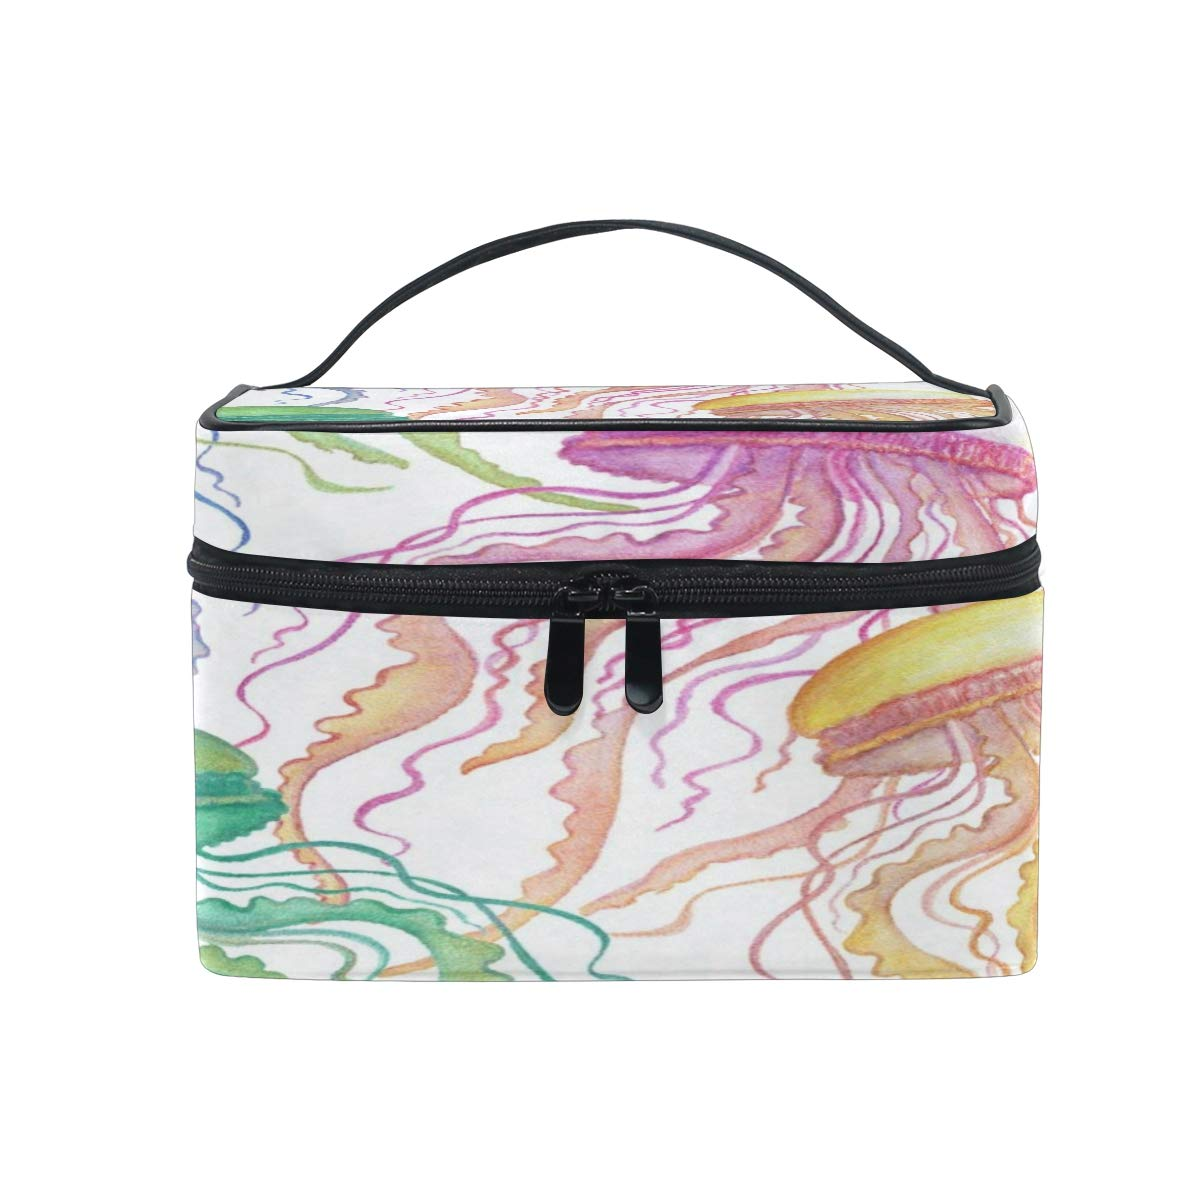 Cosmetic Bag Jellyfish Colorful Makeup Bag Travel Toiletry Bag Cosmetic Train Case Make-Up Tote Organizer Box Storage With Mesh Bag Brush Holder for Women Kids Girls Men